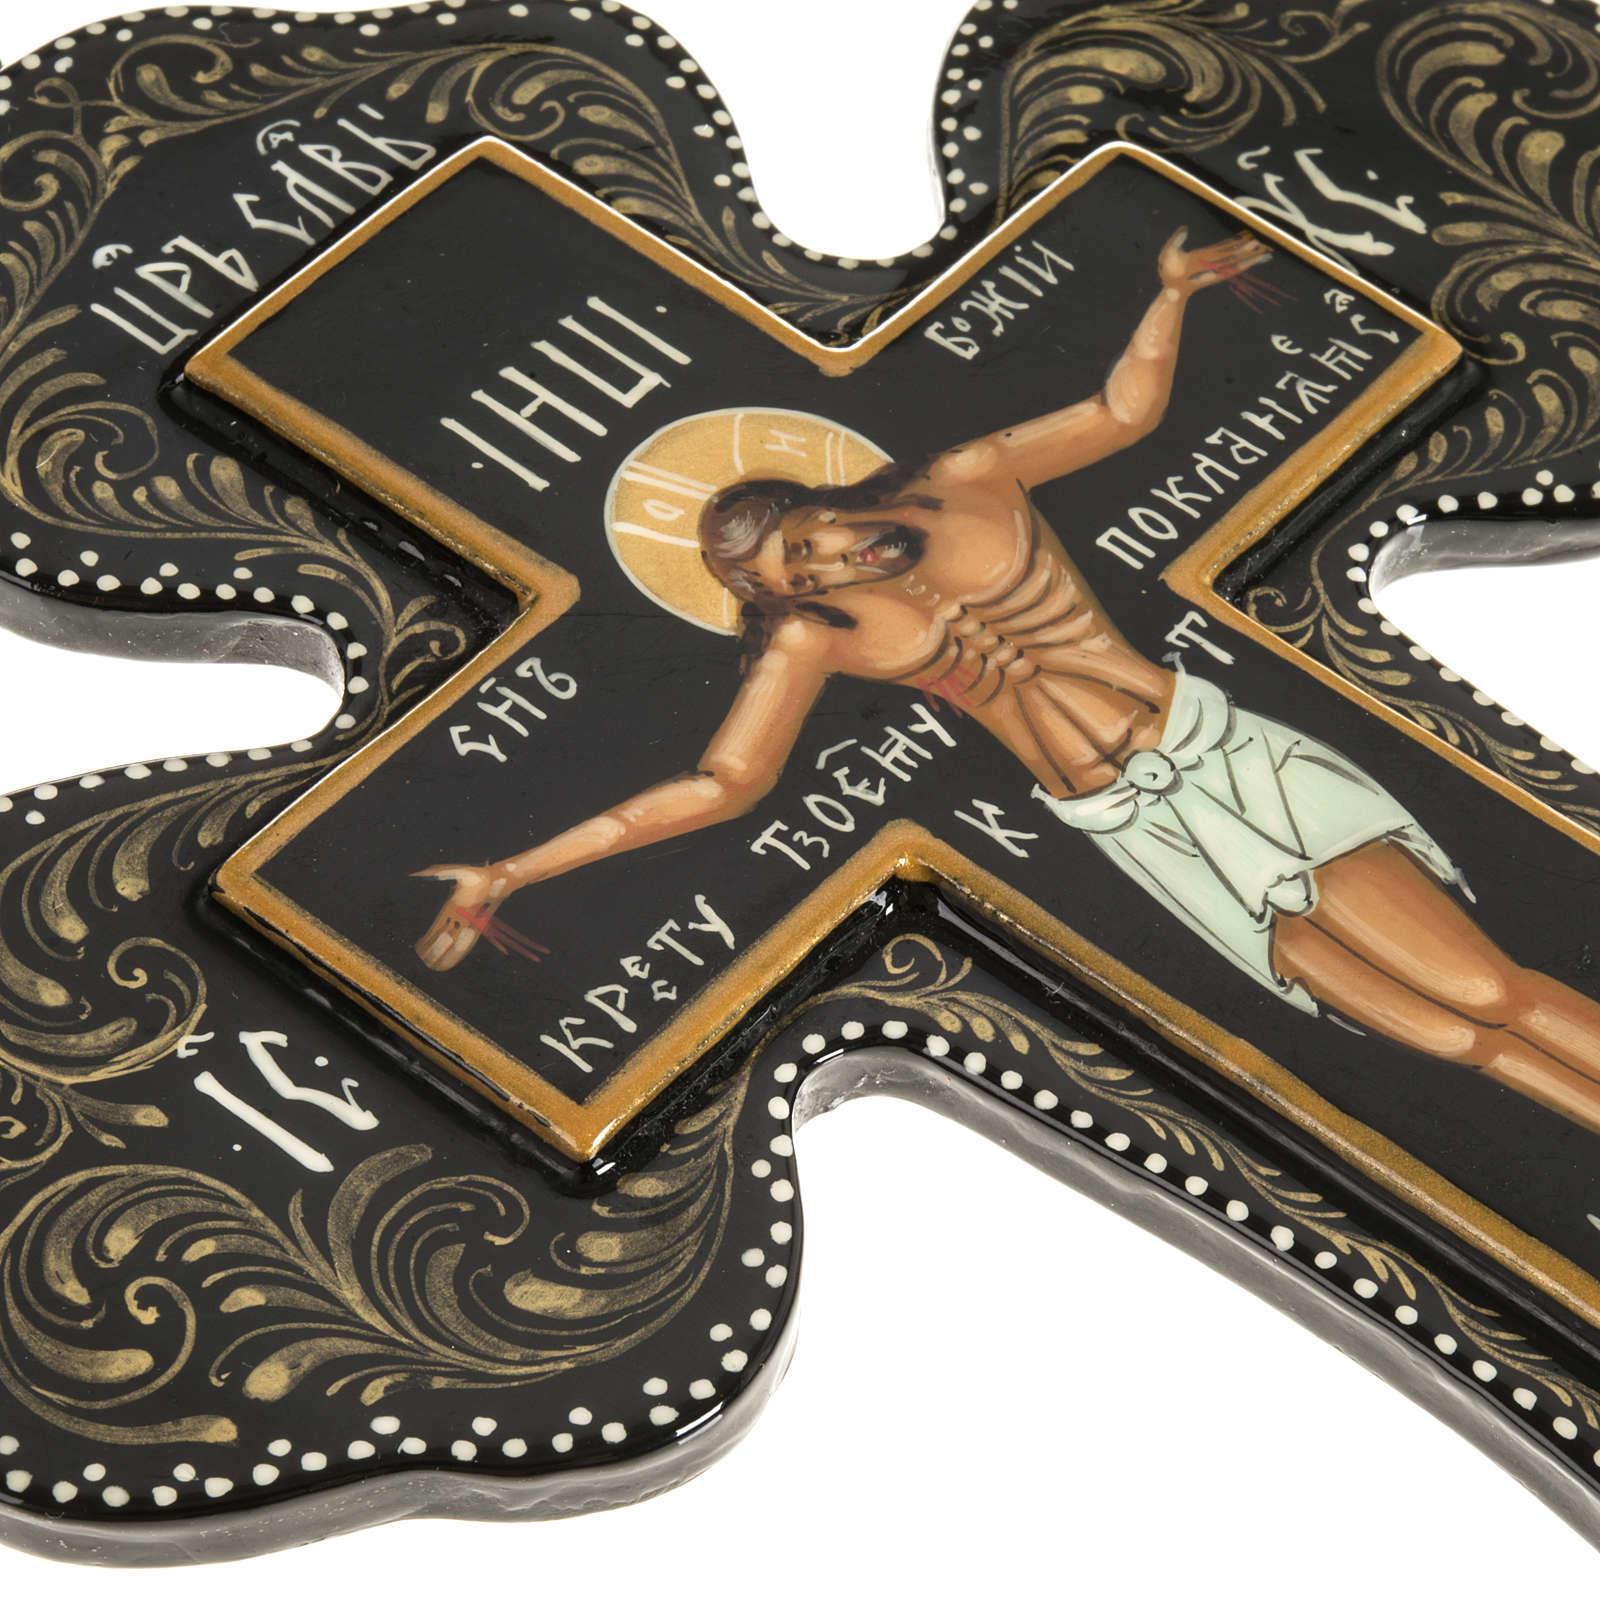 Cross icon, Mstjora, 18x15cm 4